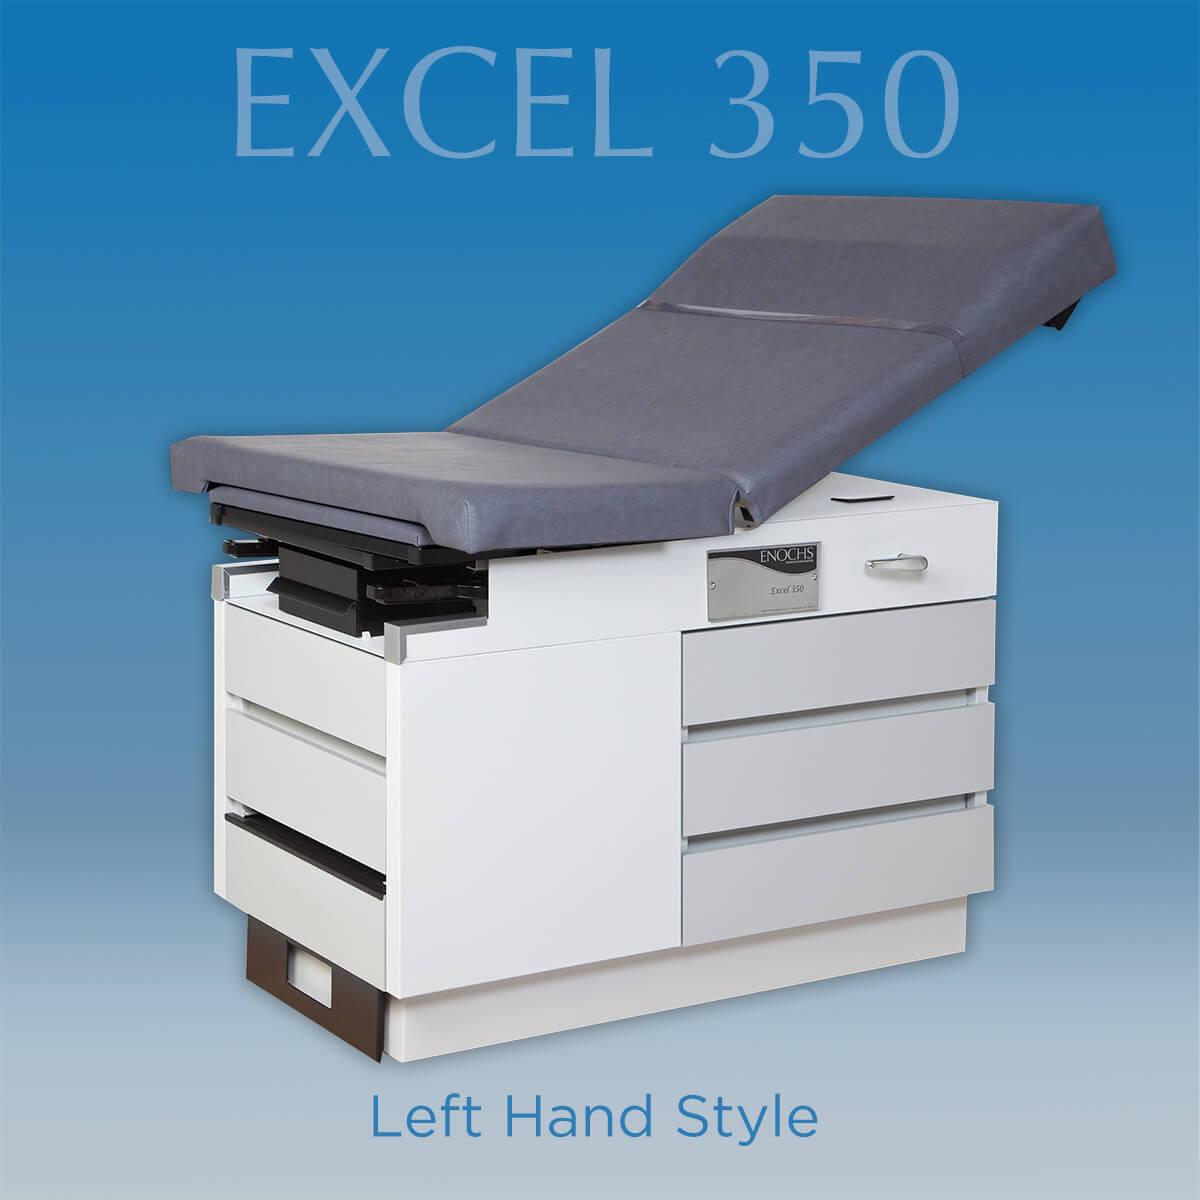 350-LH-Style.jpg